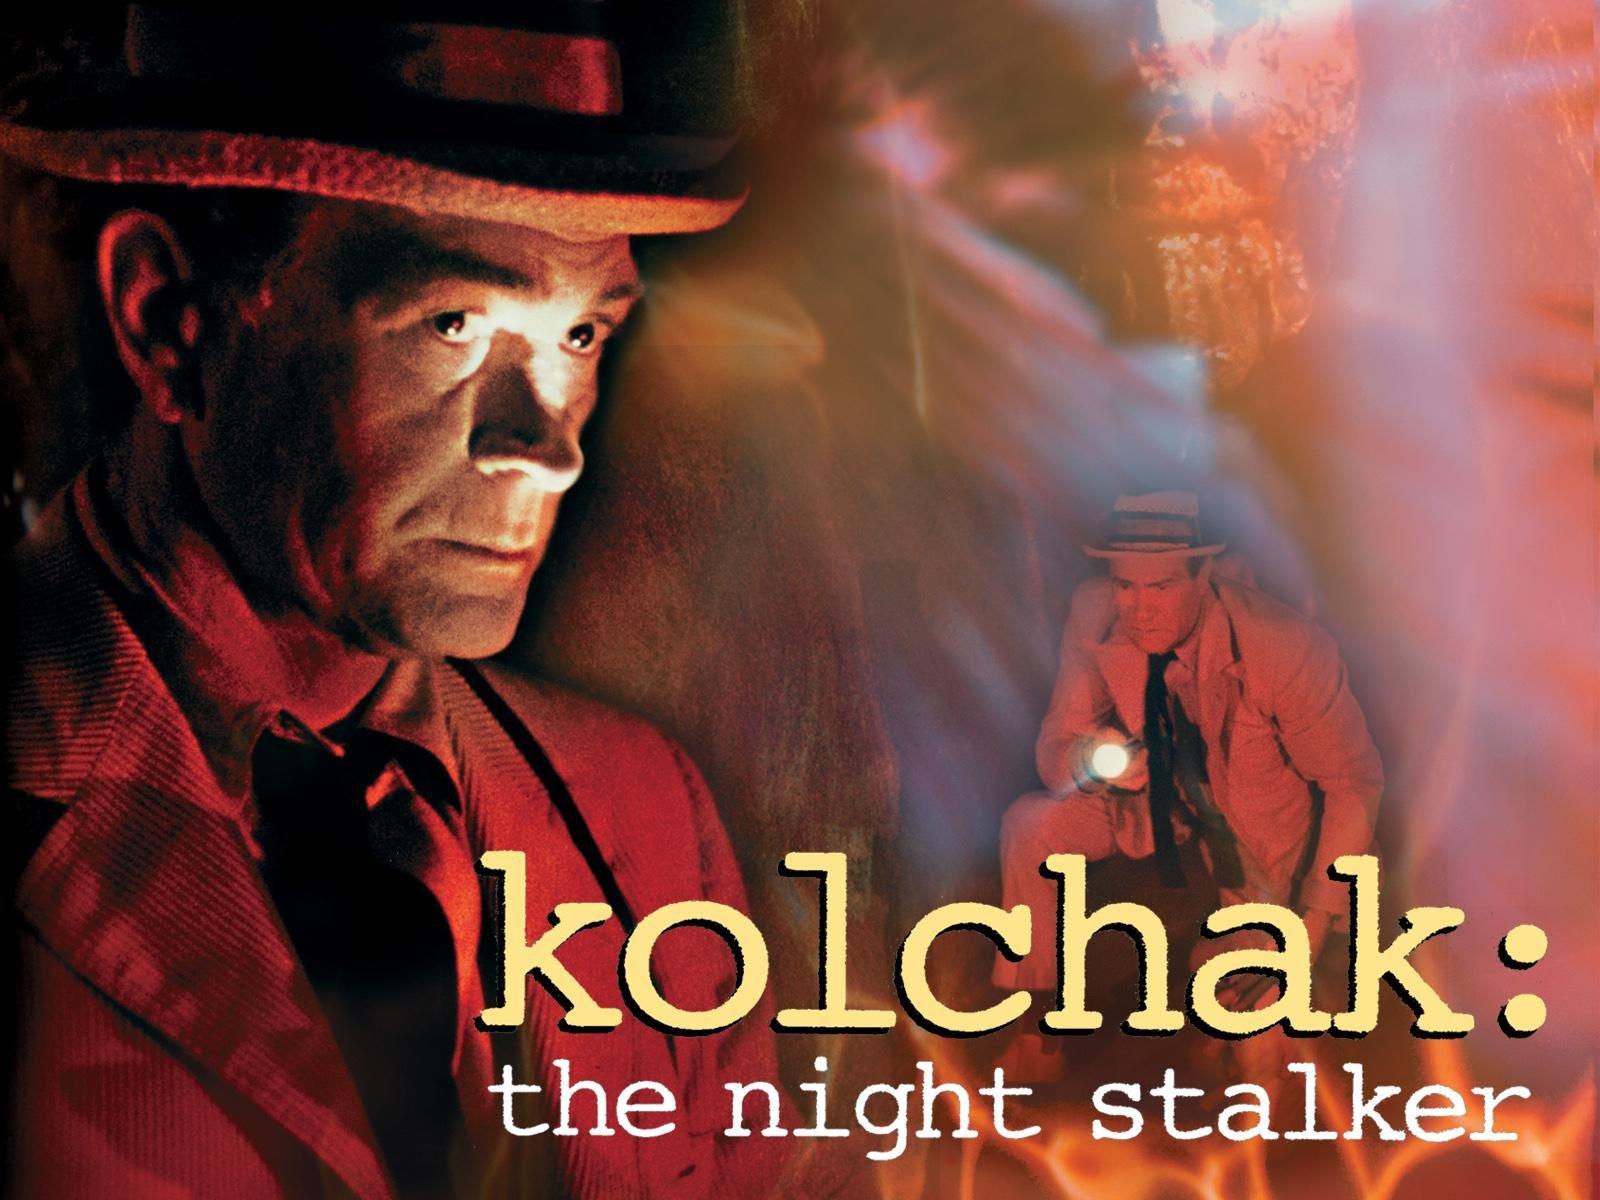 the night stalker - photo #18